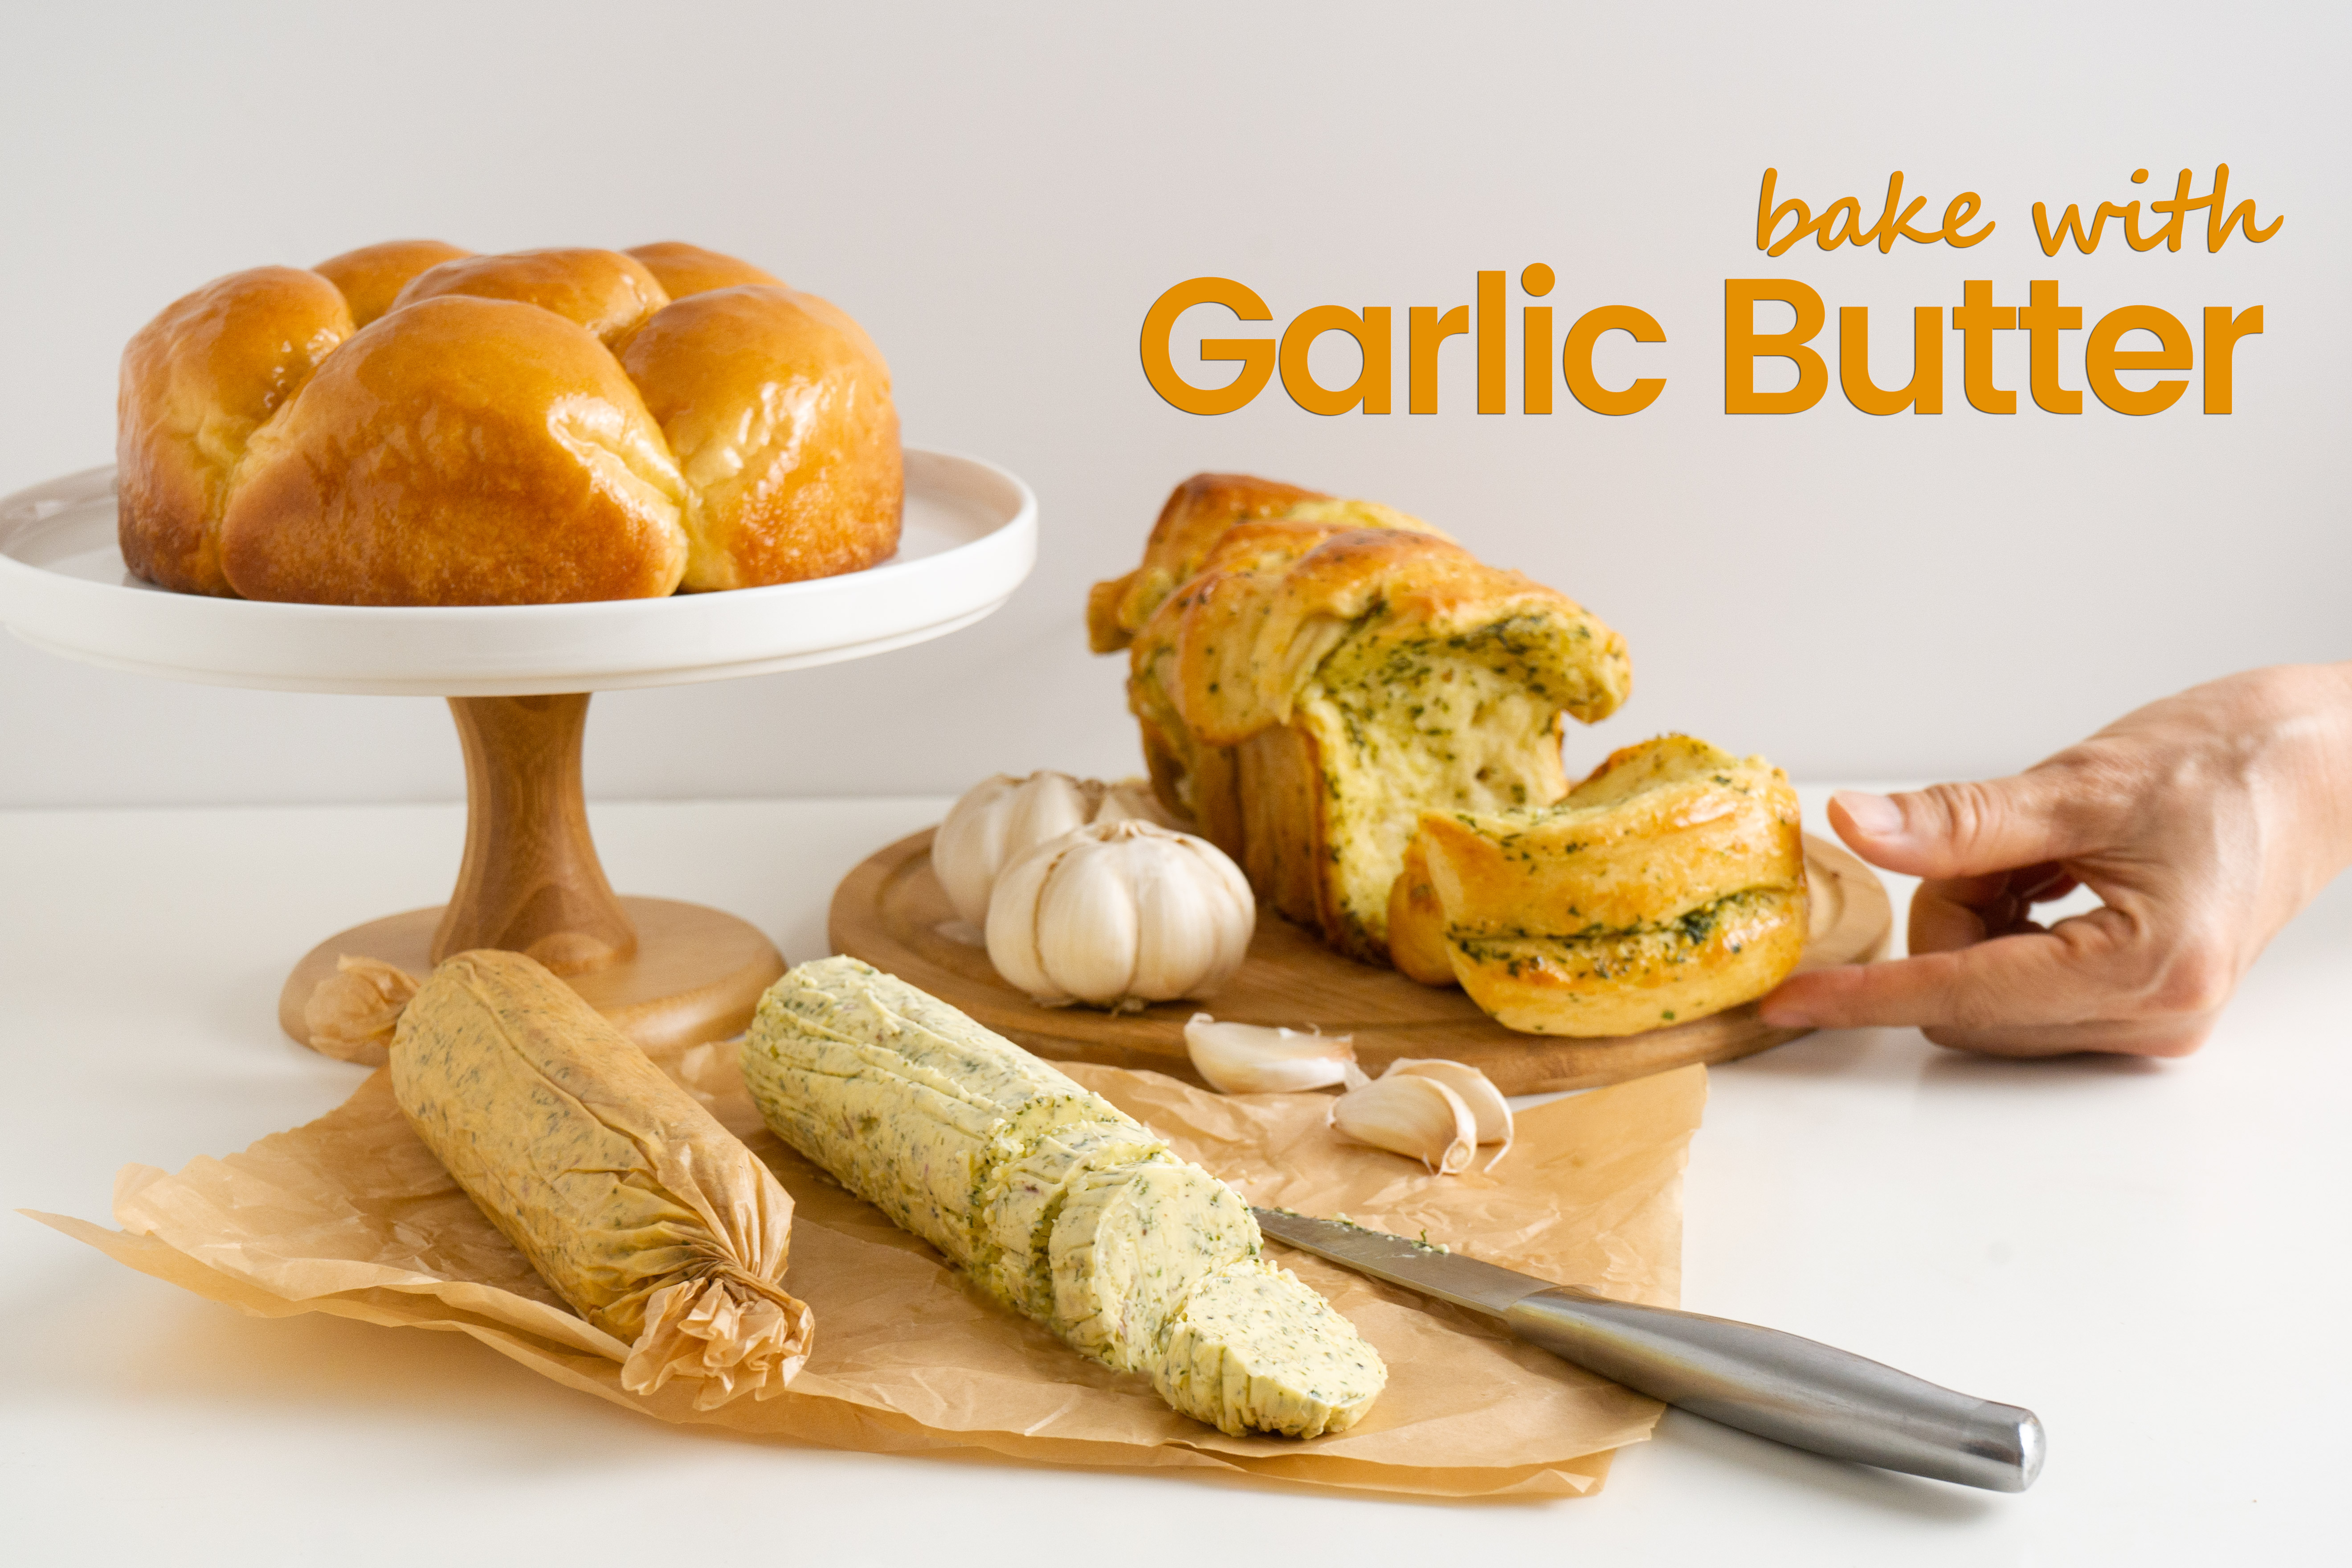 840x560-Bake-w-Garlic-Butter-w-Title